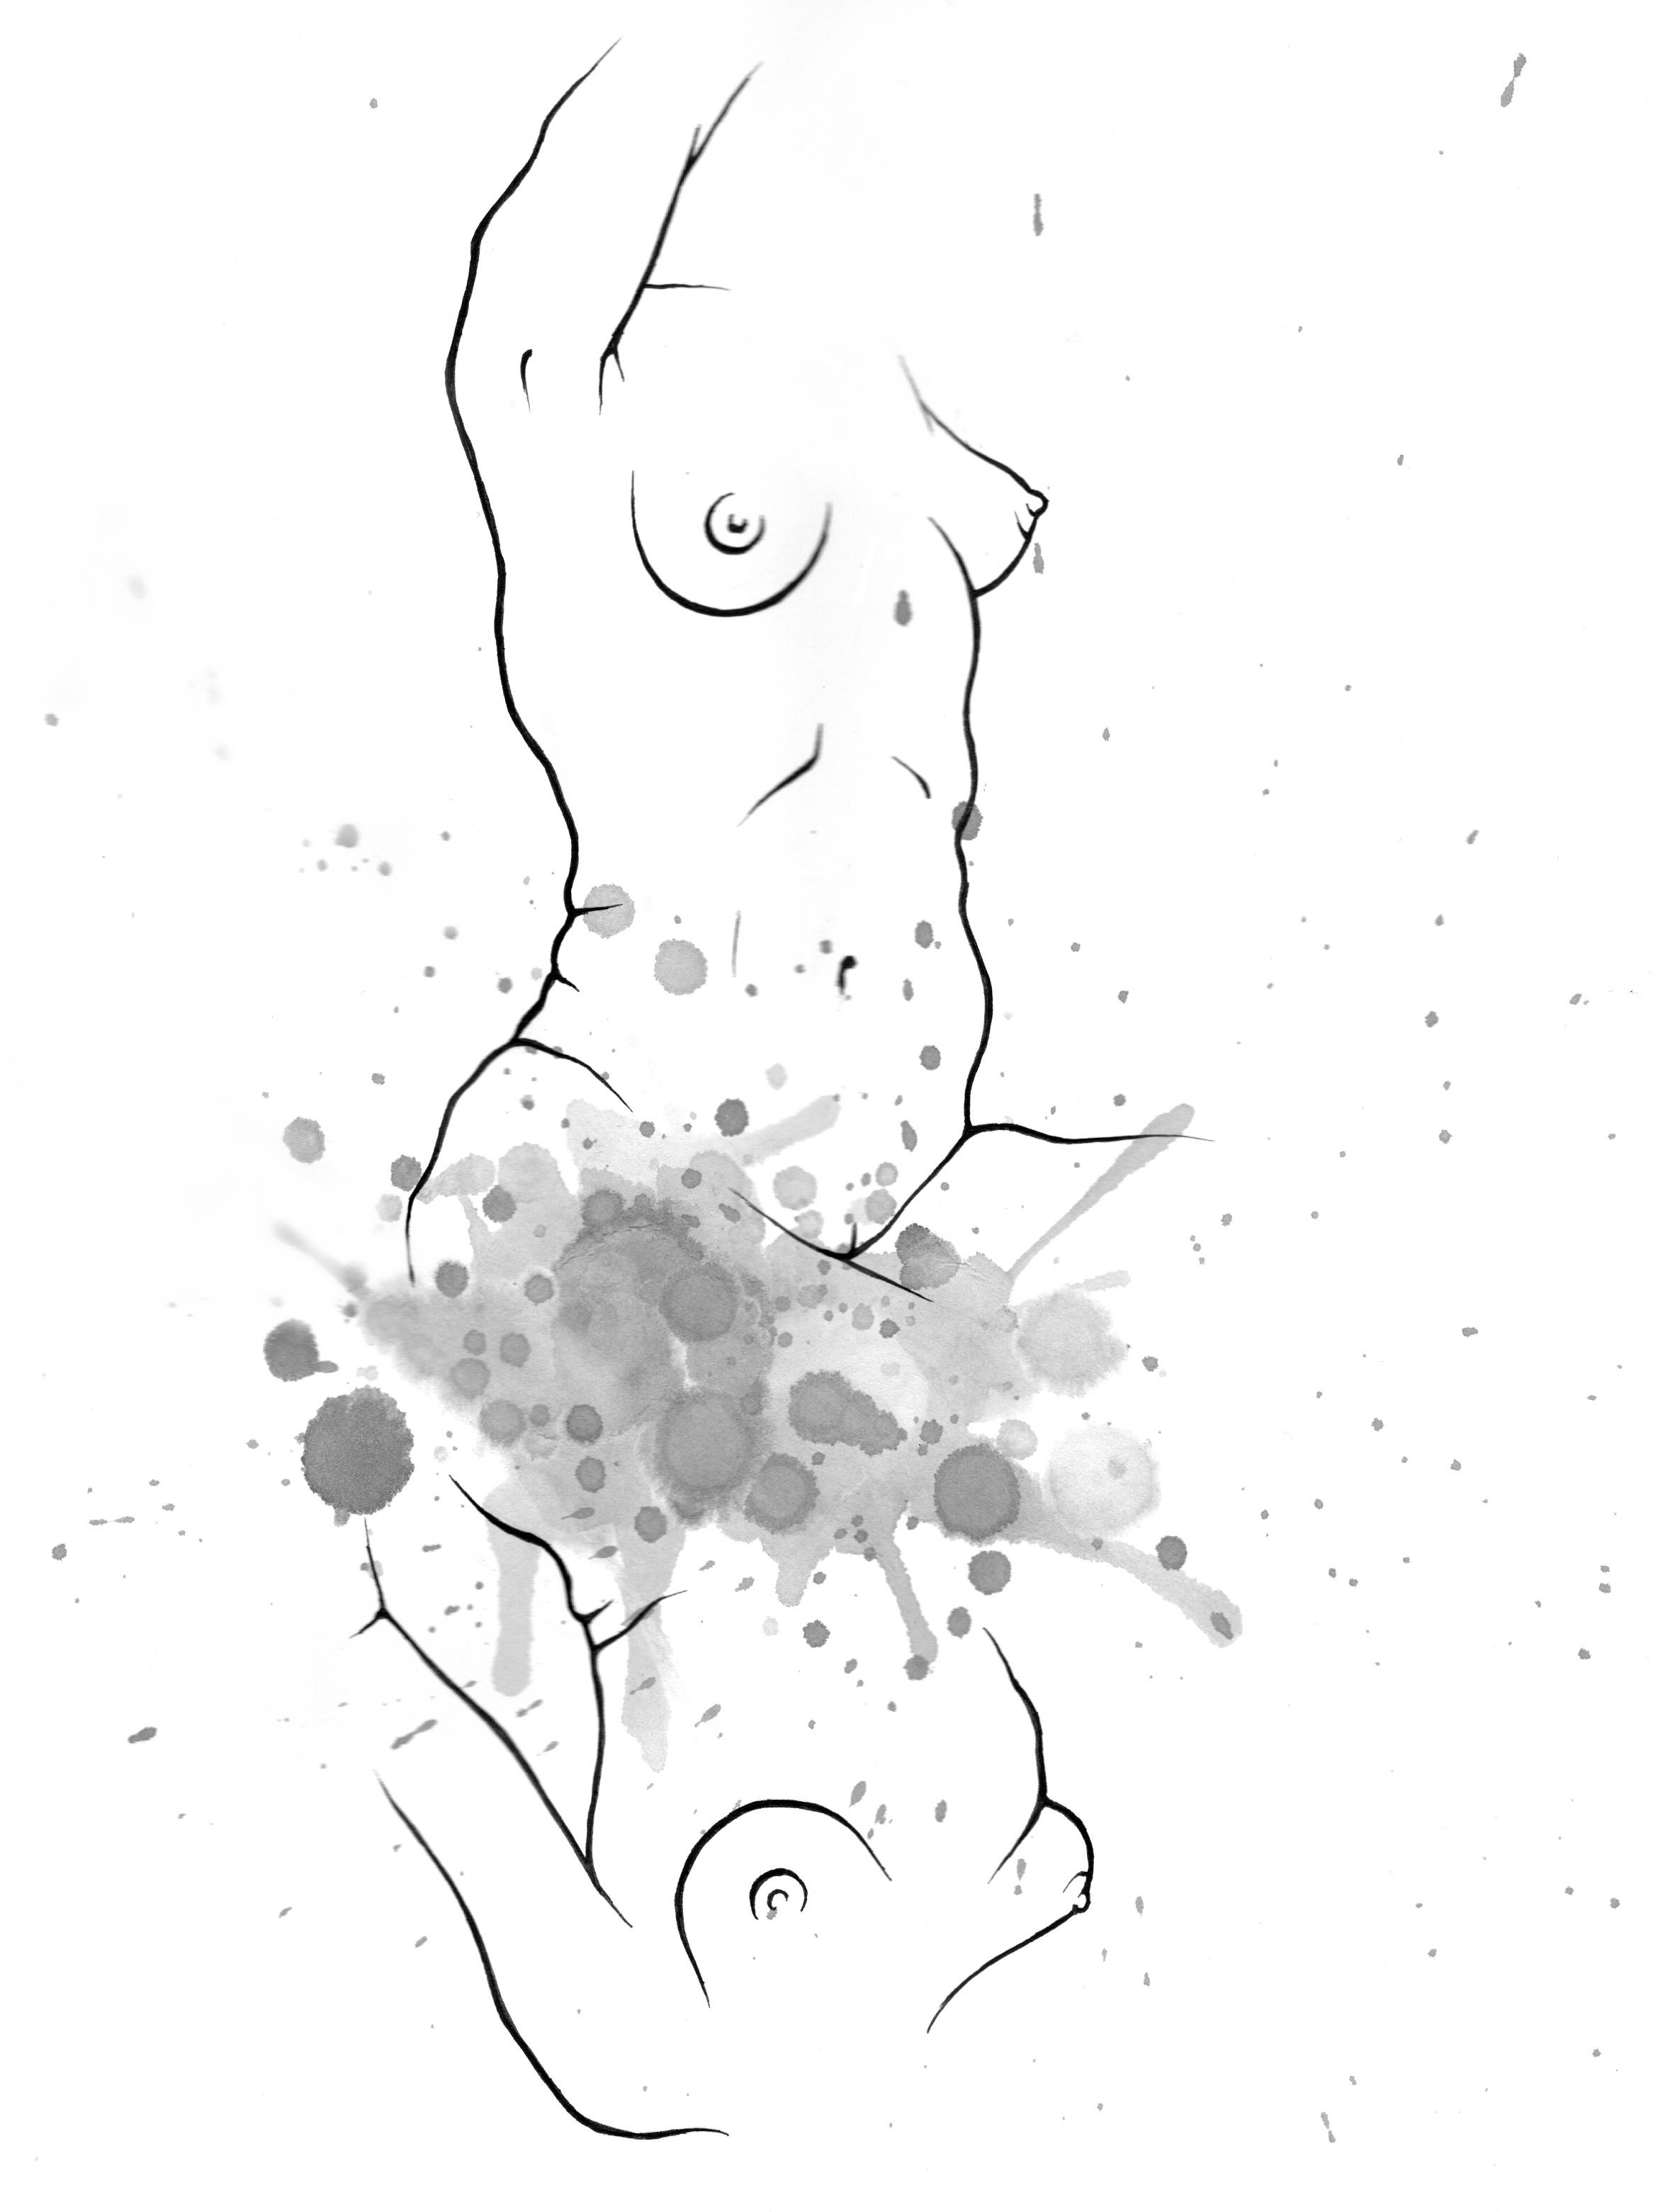 poetry_illustrations_0001.jpg